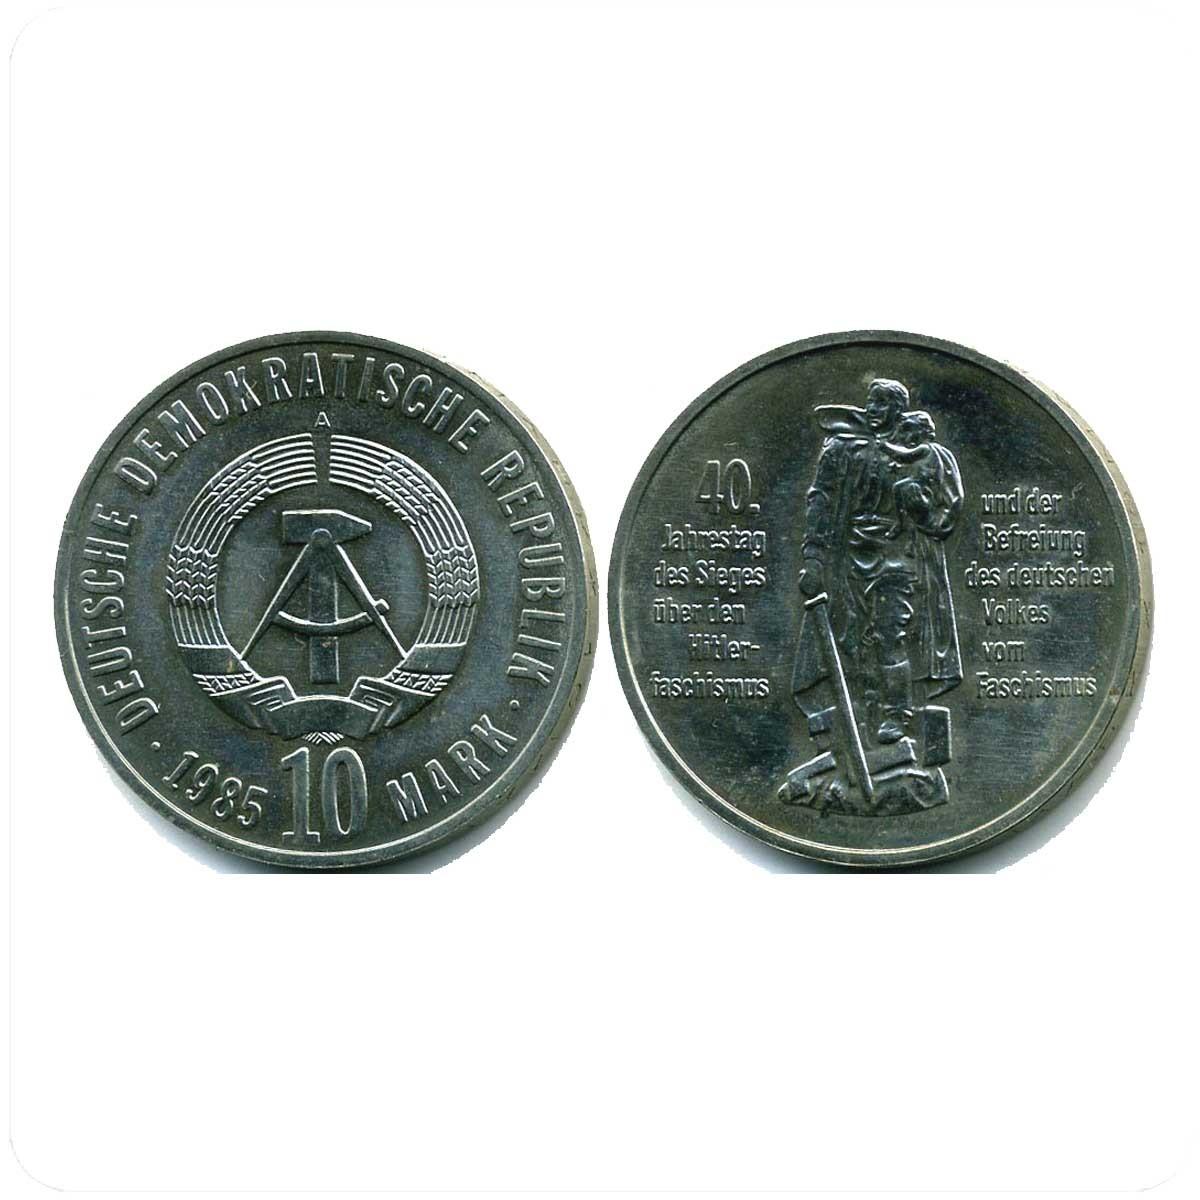 ГДР 10 марок 1985 года 40 лет Победы над фашизмом